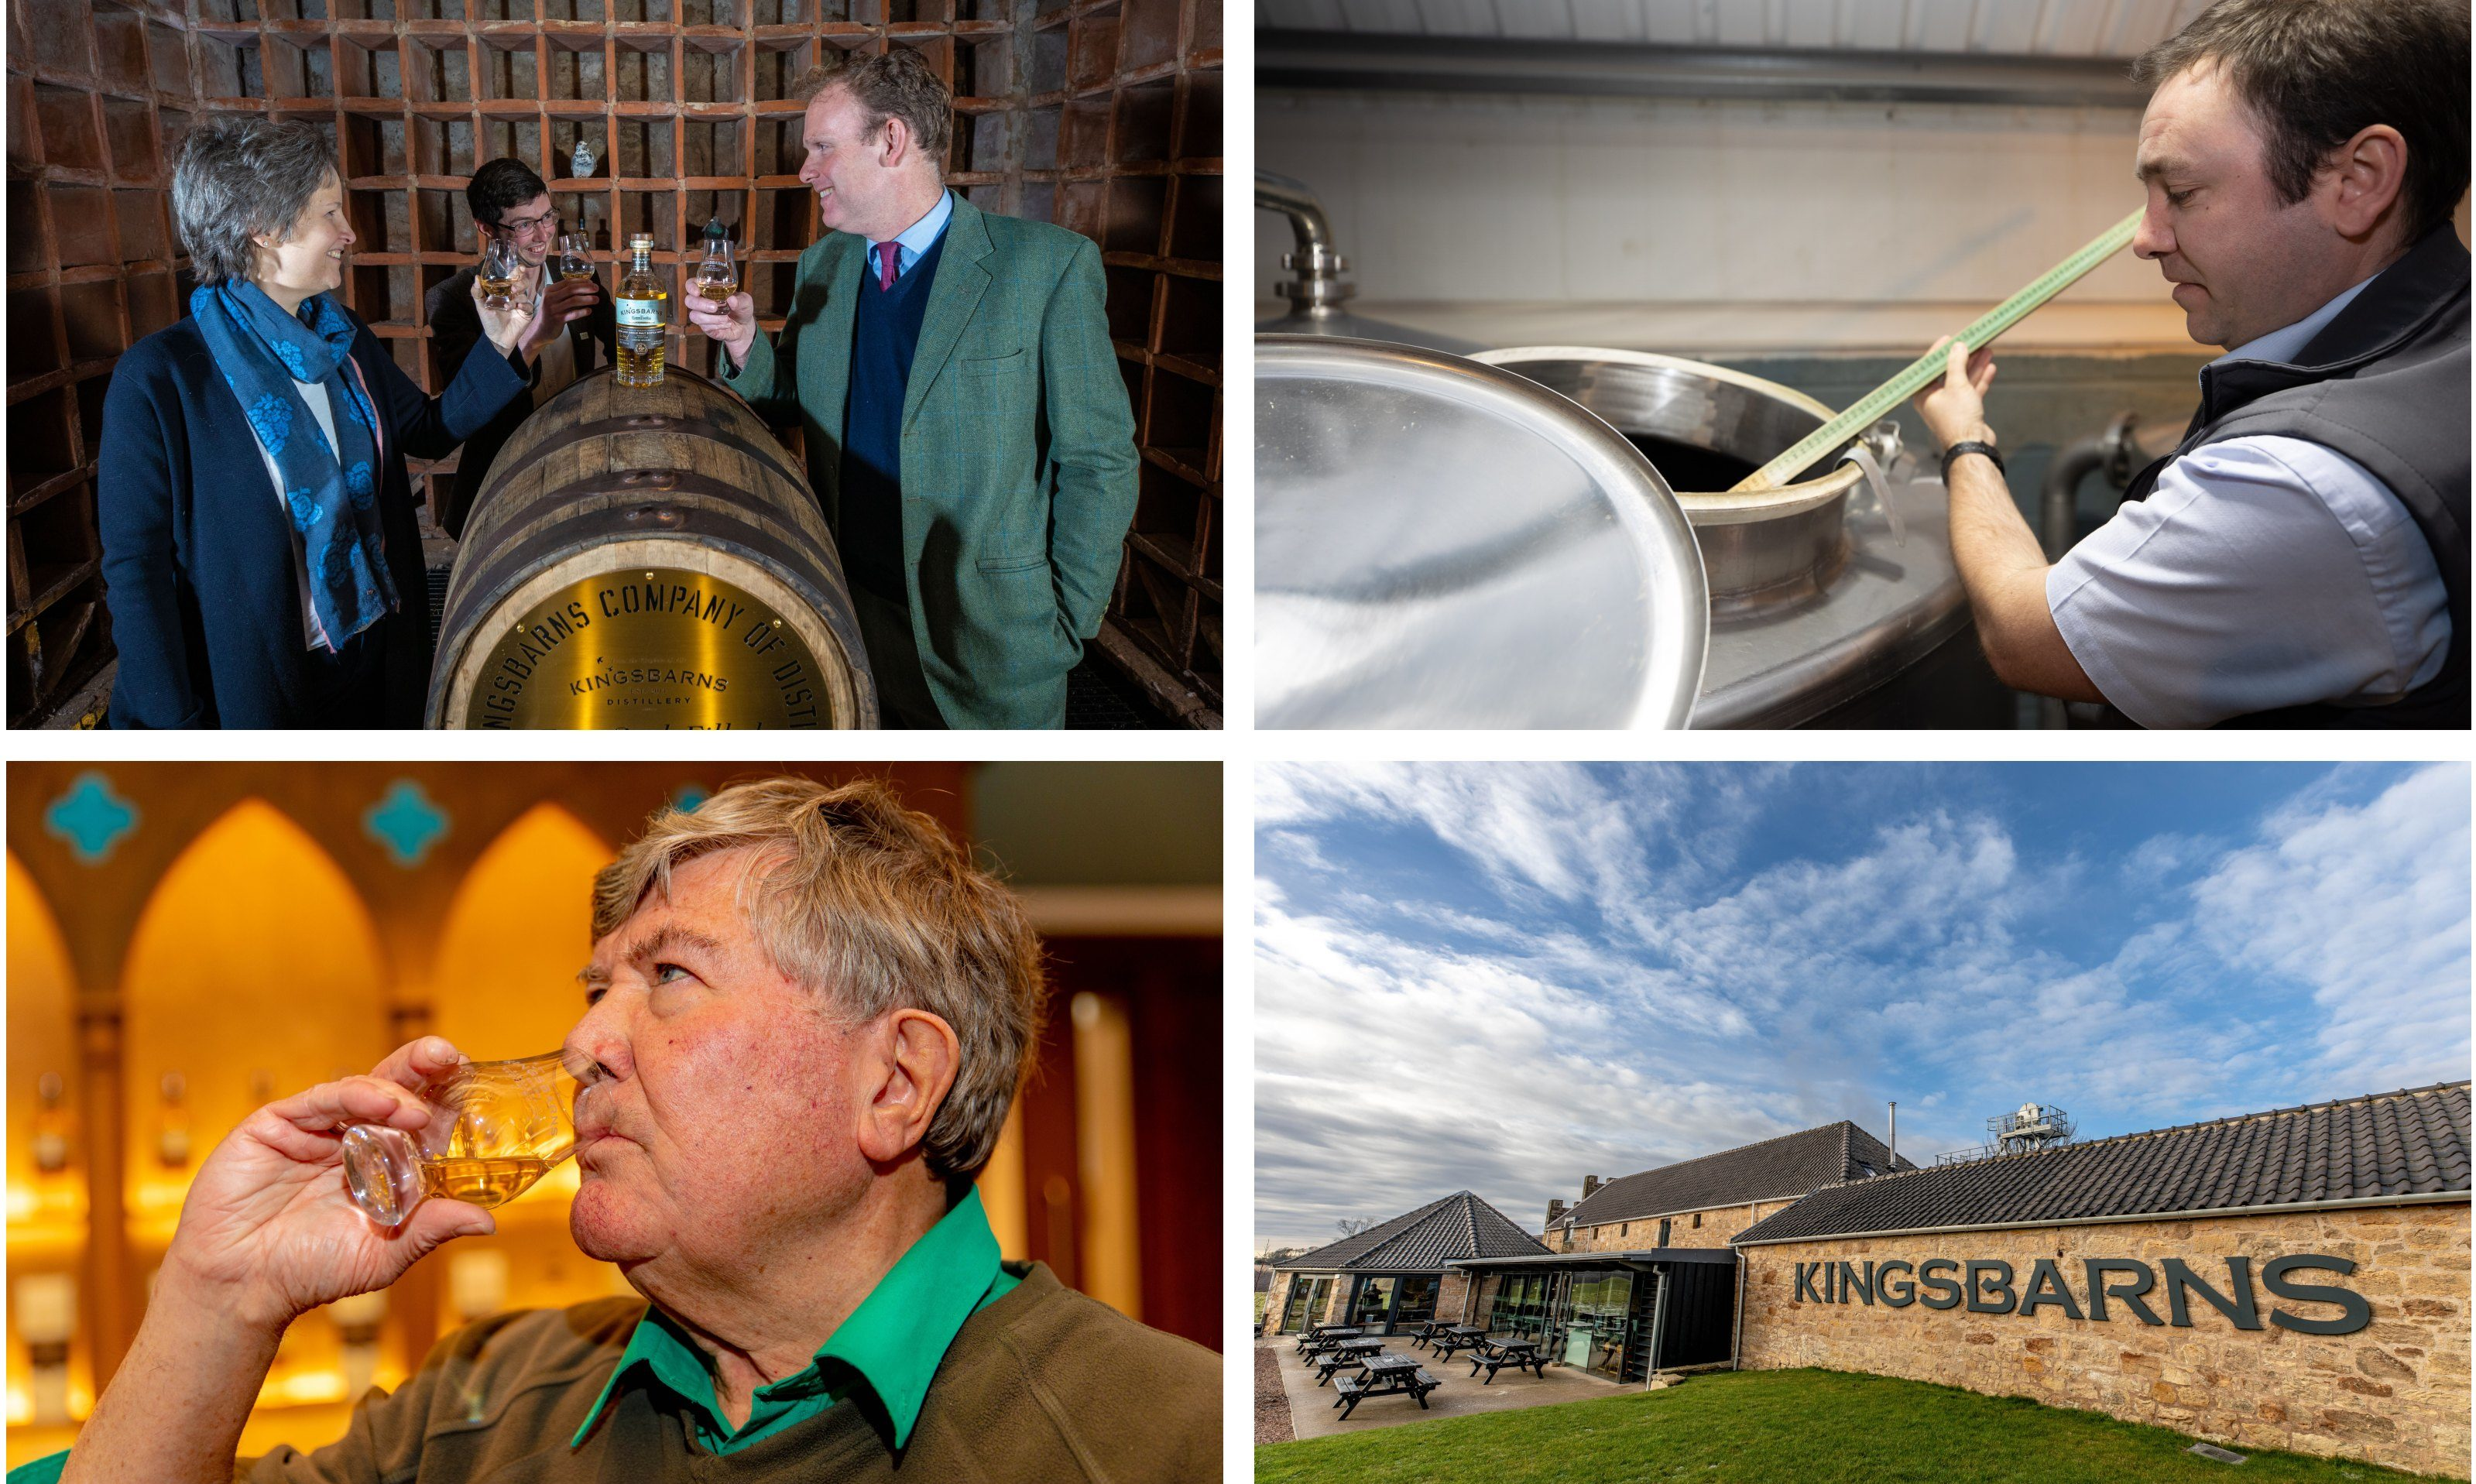 The whisky launch at Kingbarns Distillery.